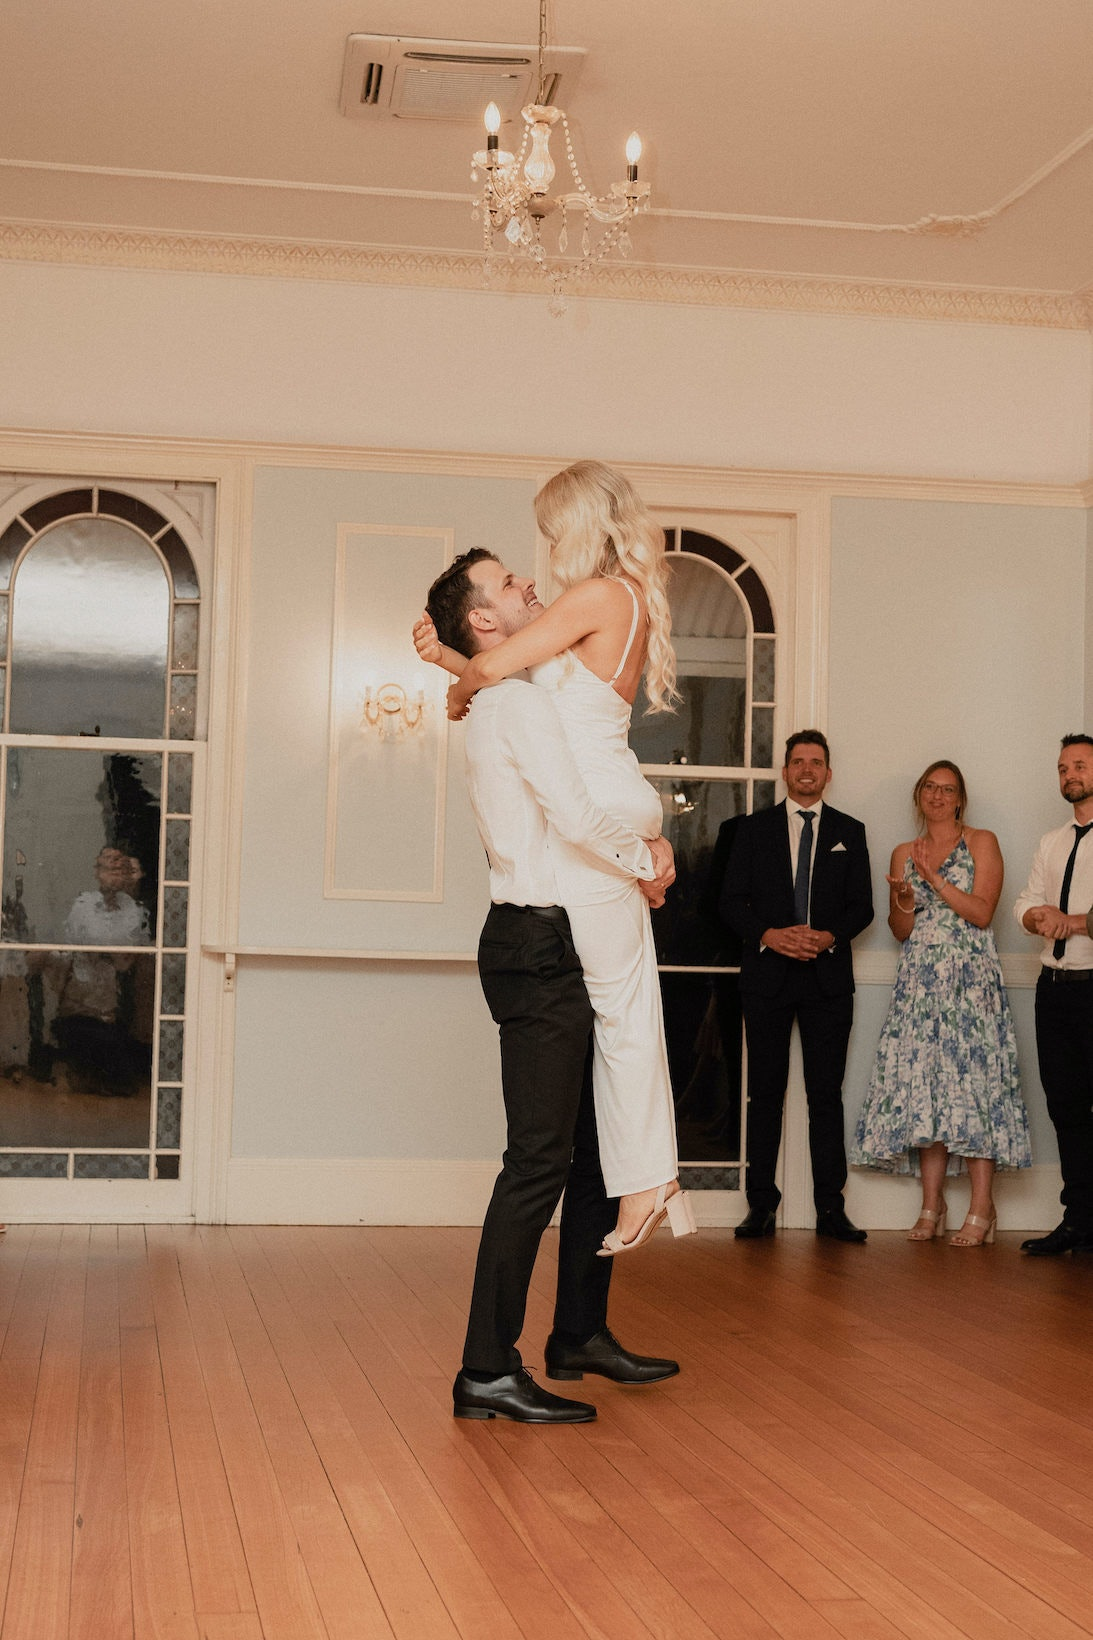 Bride and groom dancing in ballroom